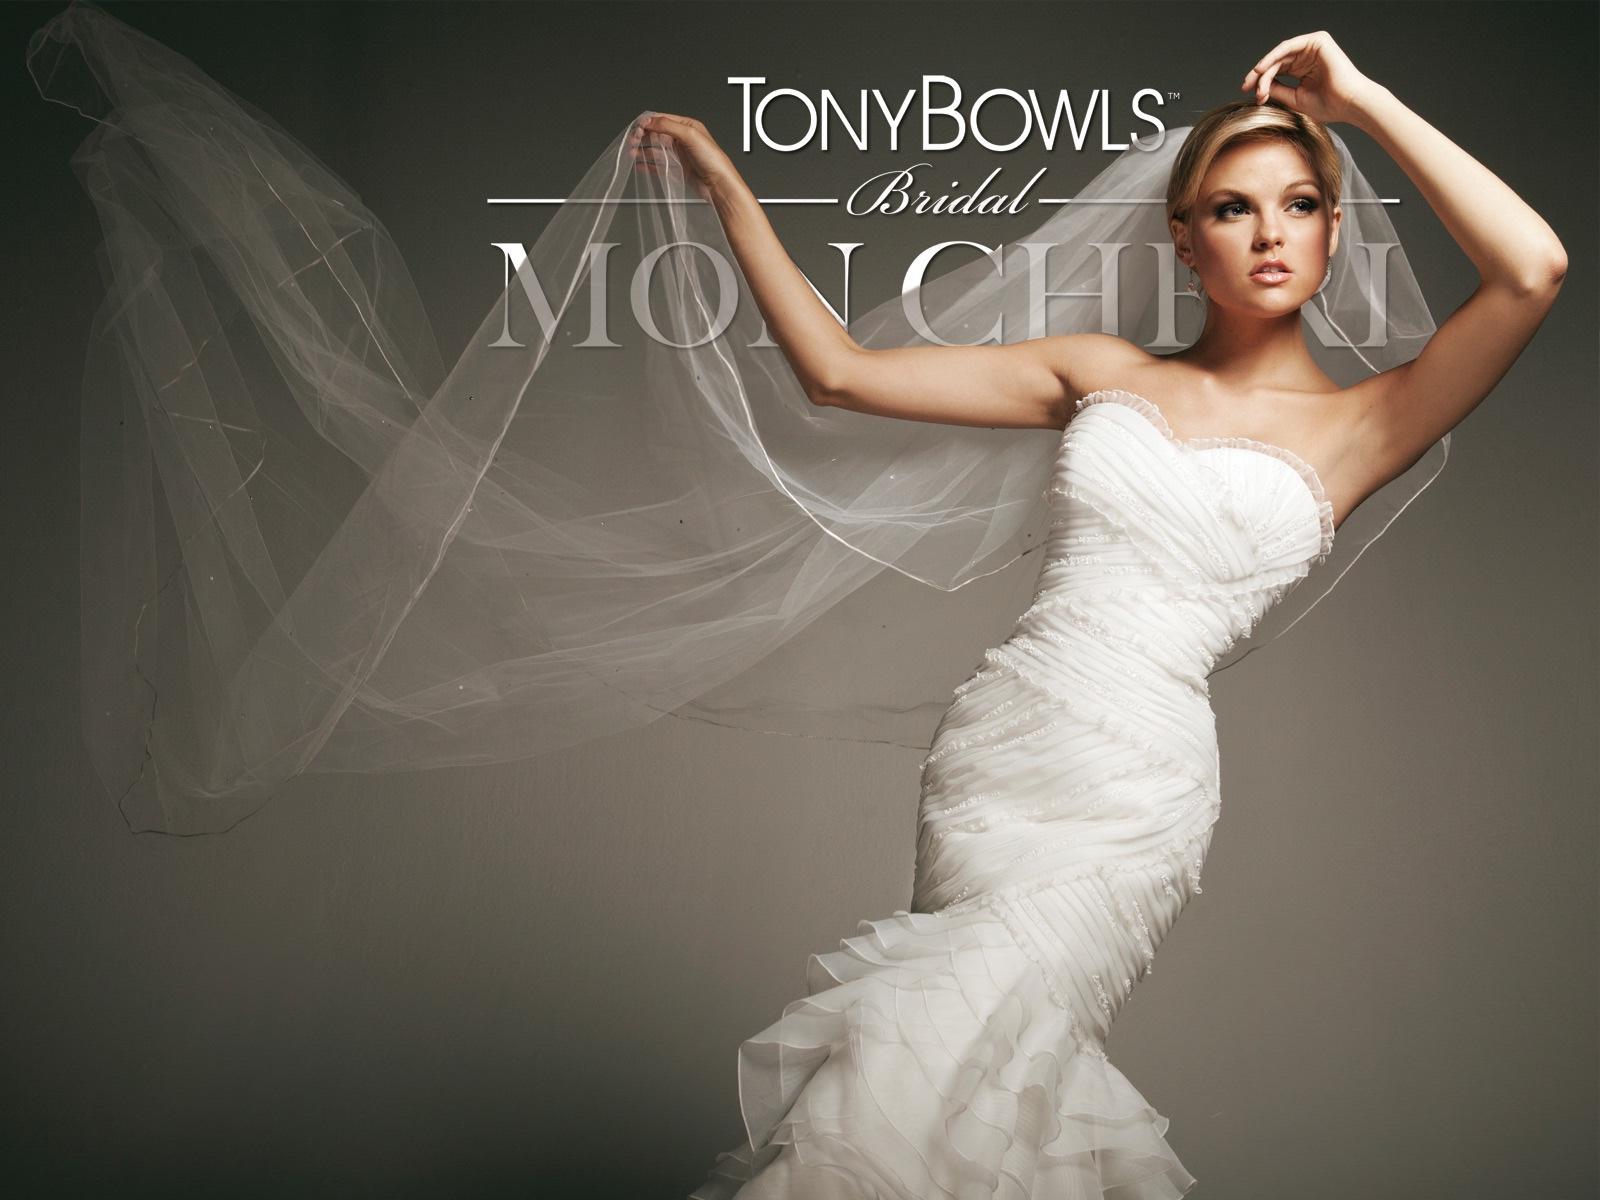 Tony Bowls 2013 Spring Bridal Wedding Dresses - World of Bridal